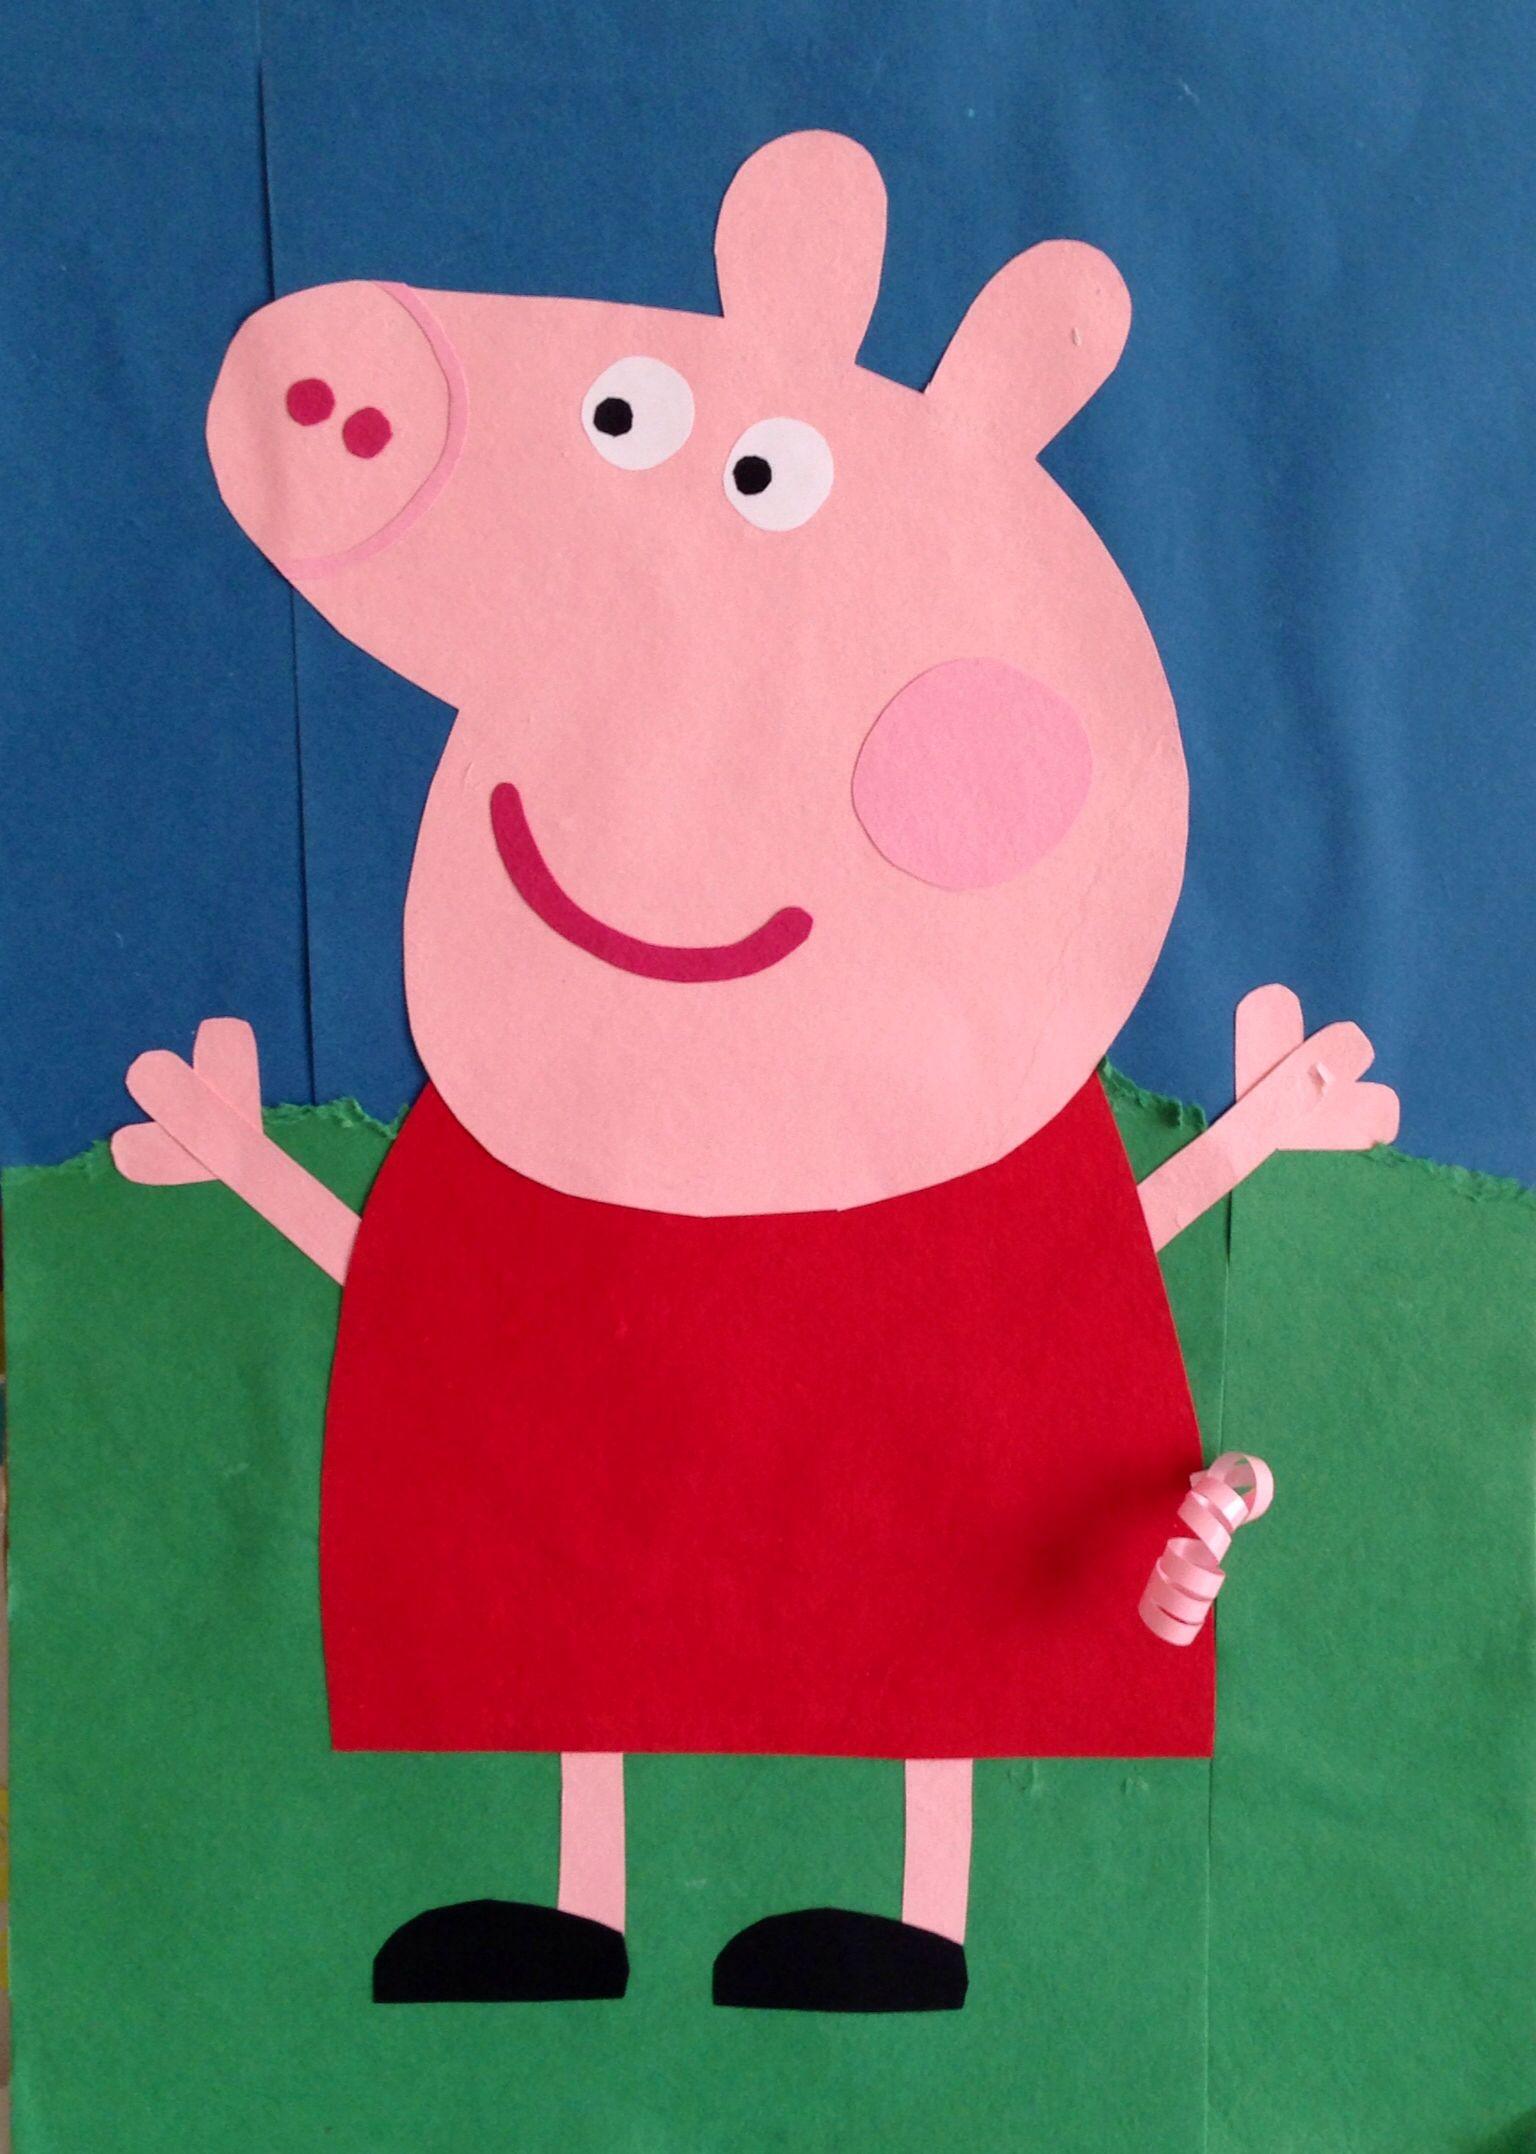 Amazon.com: peppa pig games